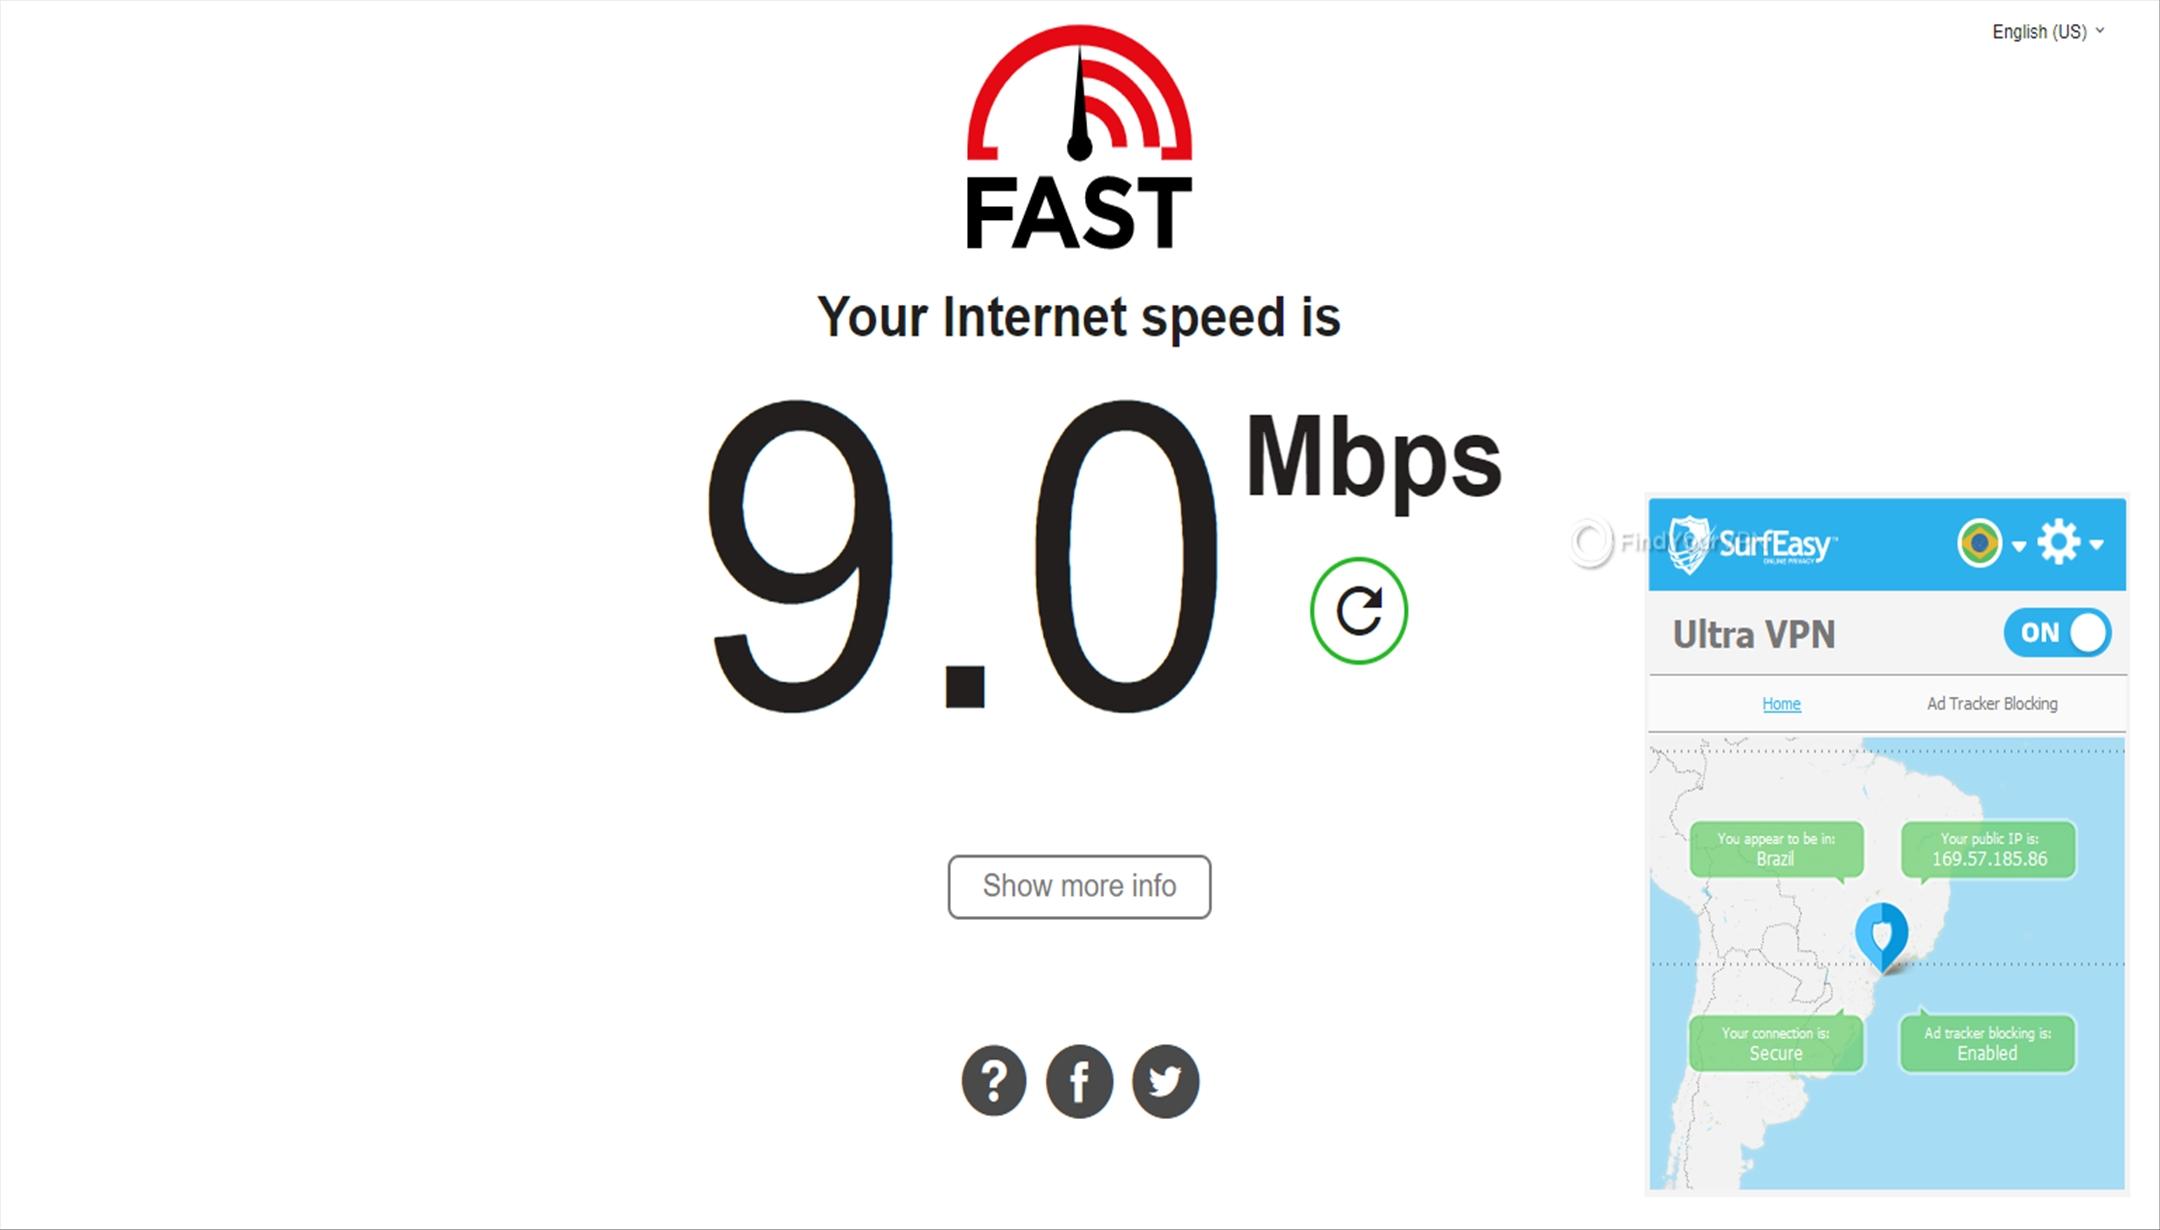 SurfEasy Speed Test Brazil 9 Mbps